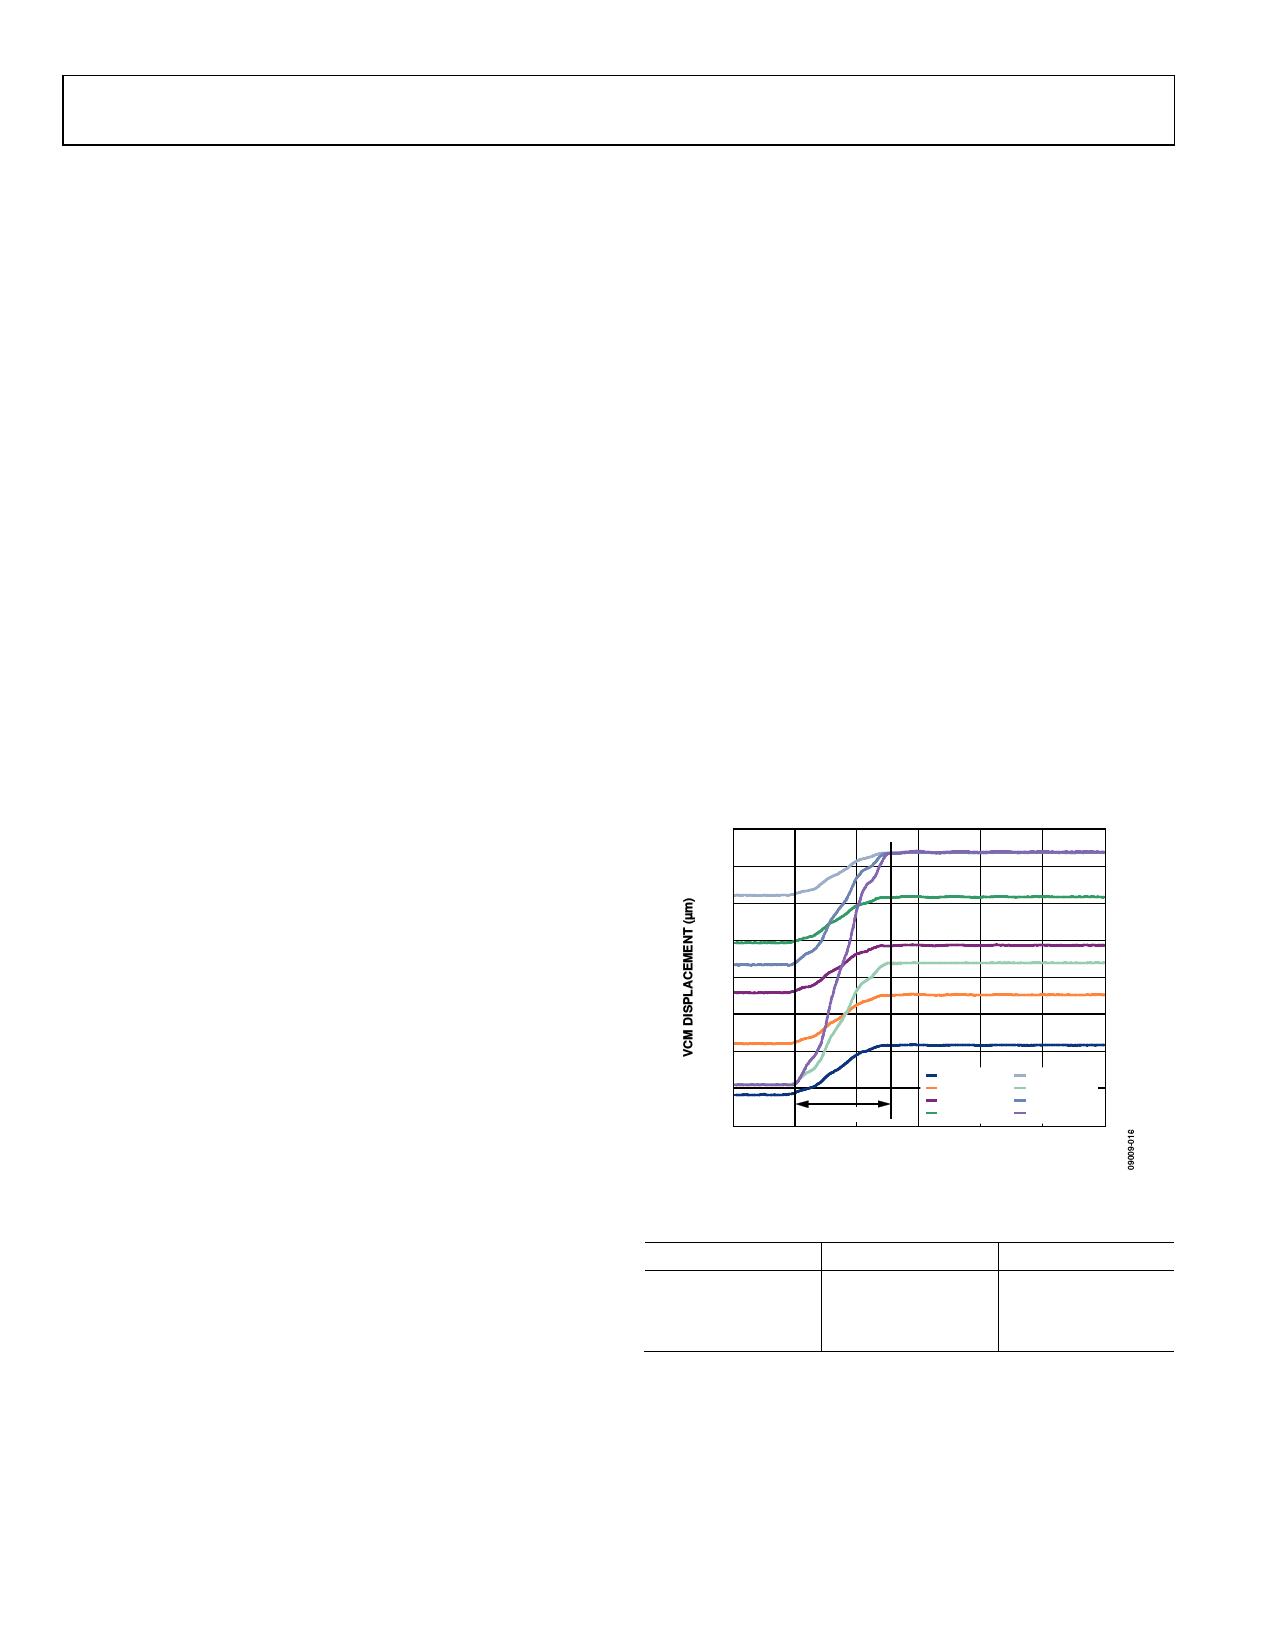 AD5823 arduino